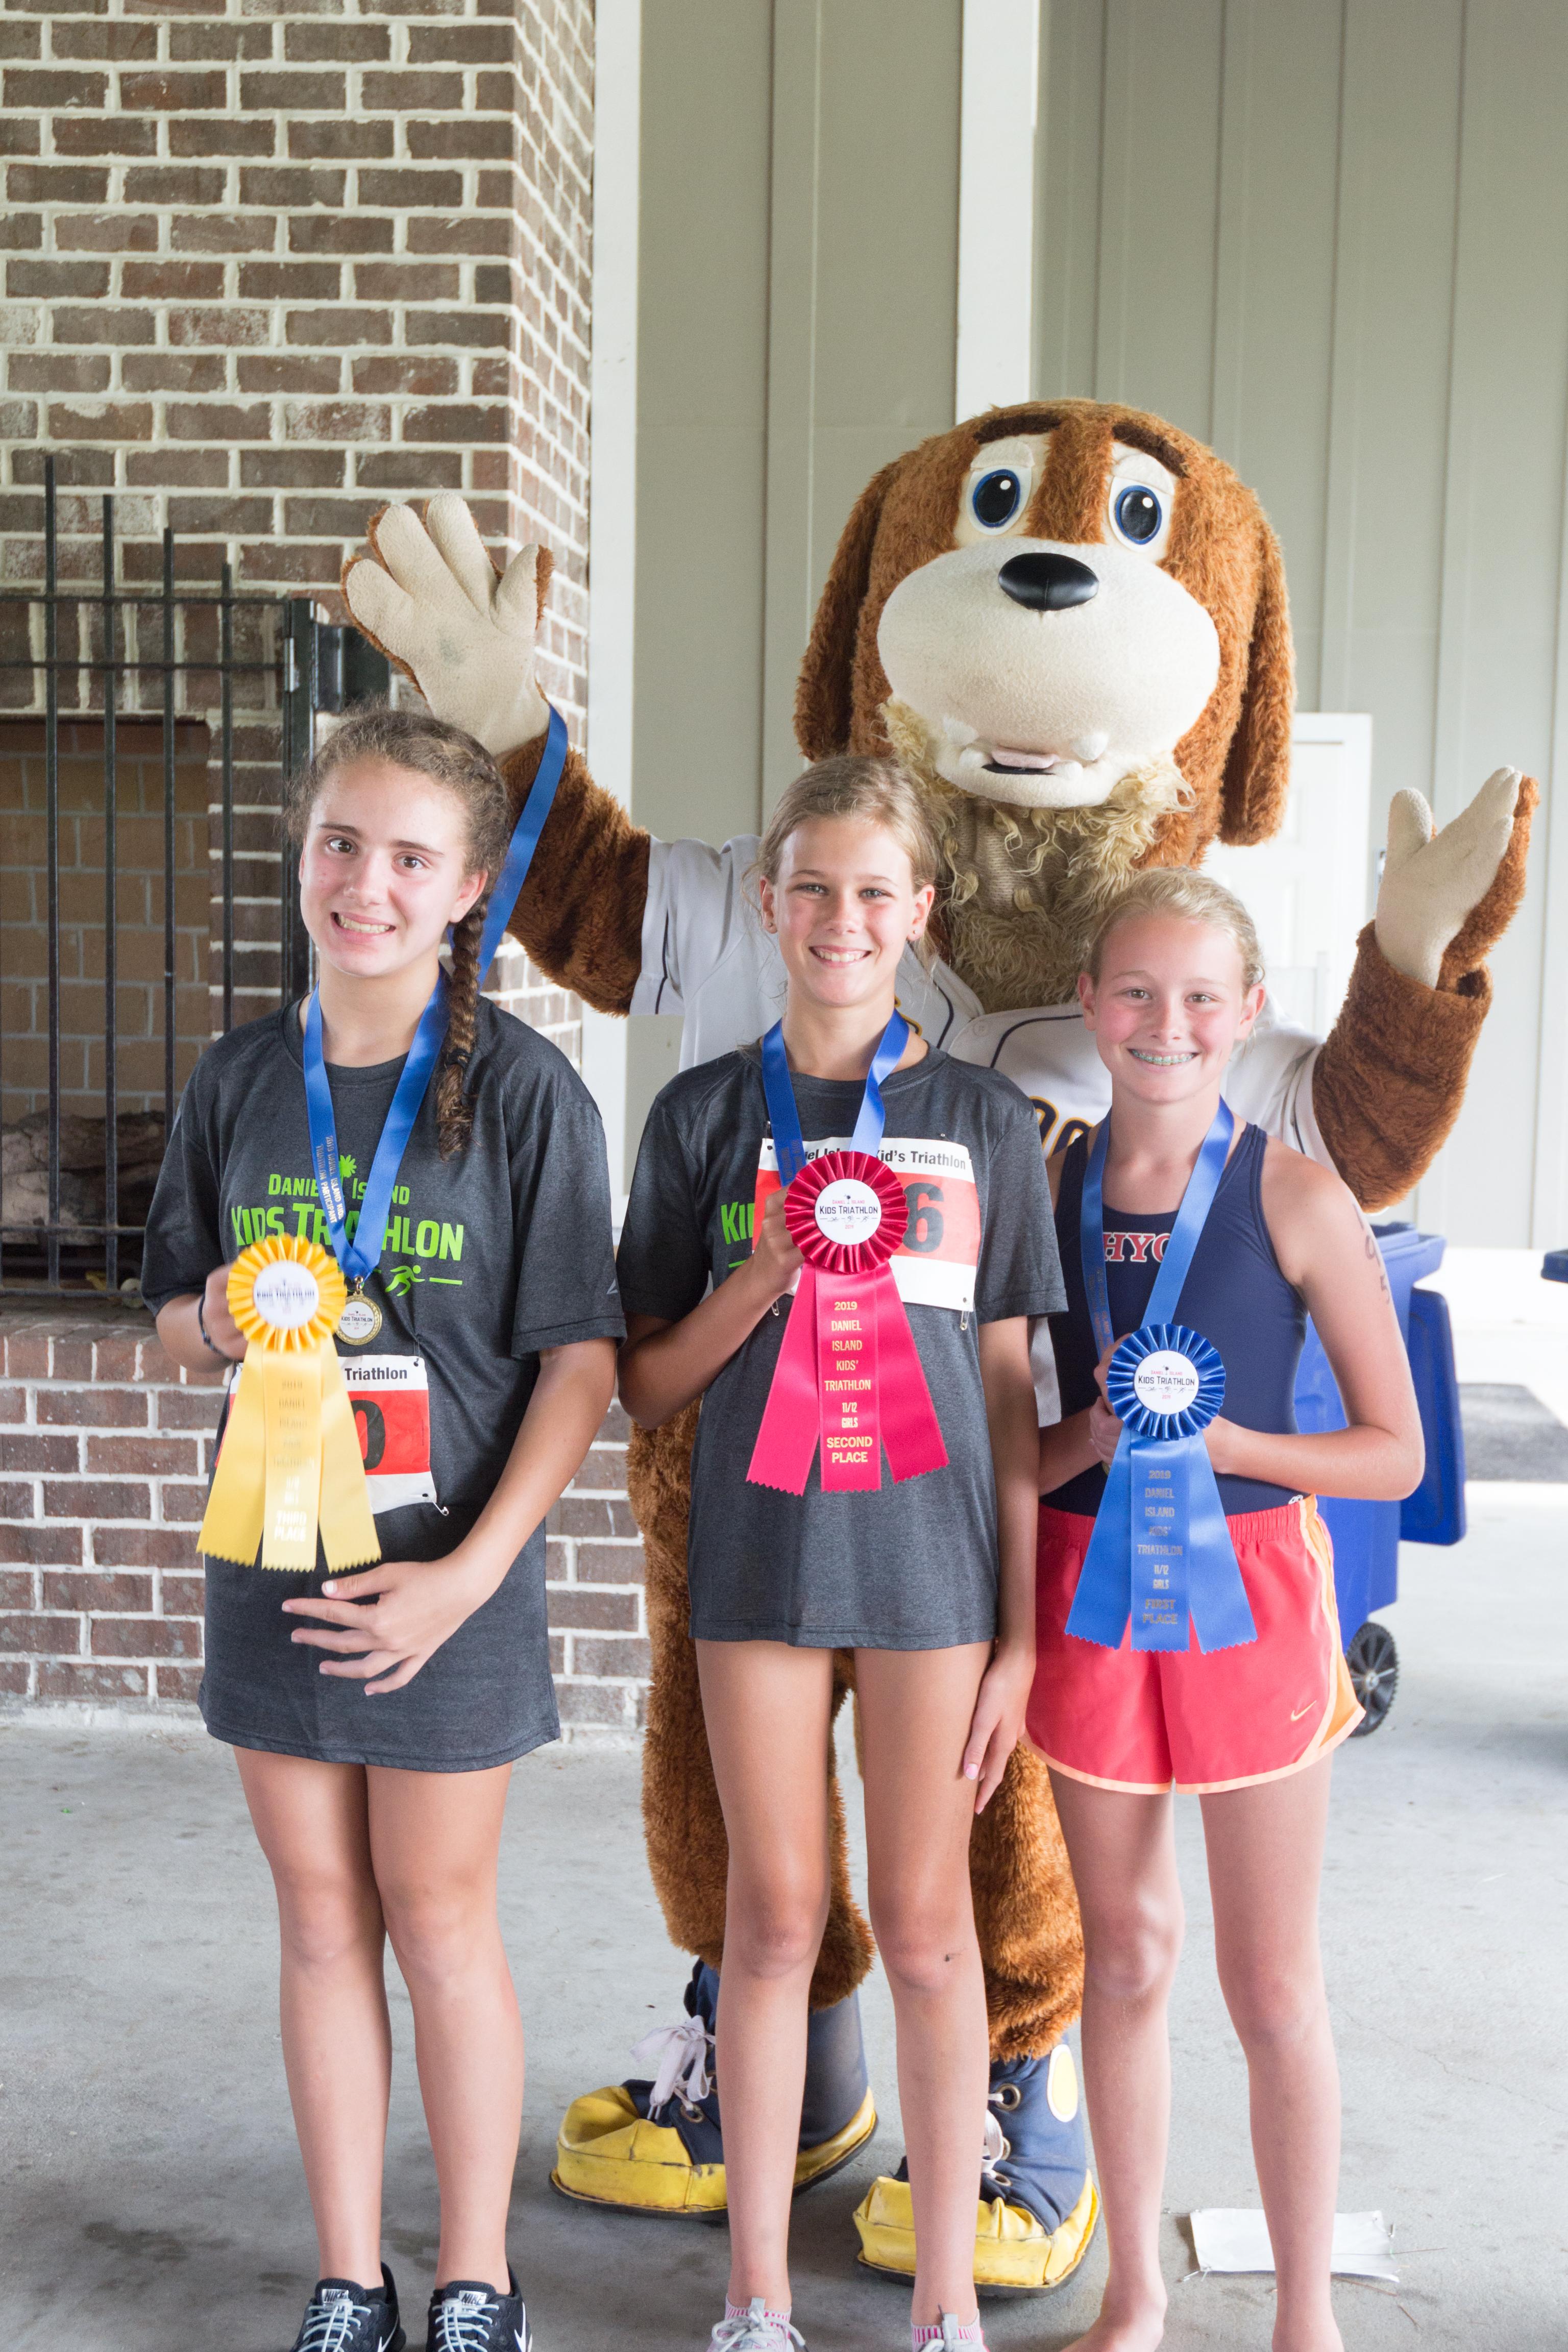 Winners in the 11-12 year old girls' category (200 meter swim, 5.5 mile bike, 1 mile run): Elizabeth Kelley (1st), Elena Evin (2nd) and Elizabeth Maltezos (3rd).